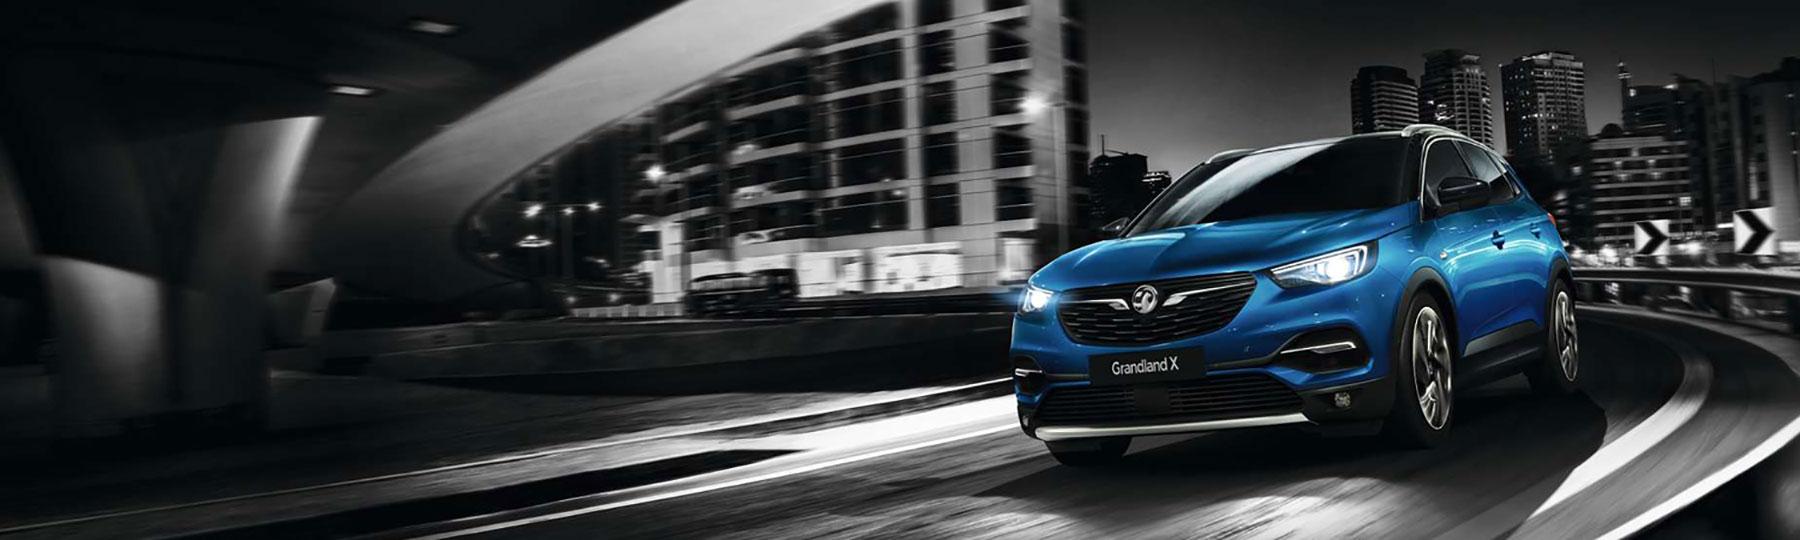 New Vauxhall Grandland X SE 1.2T 130ps